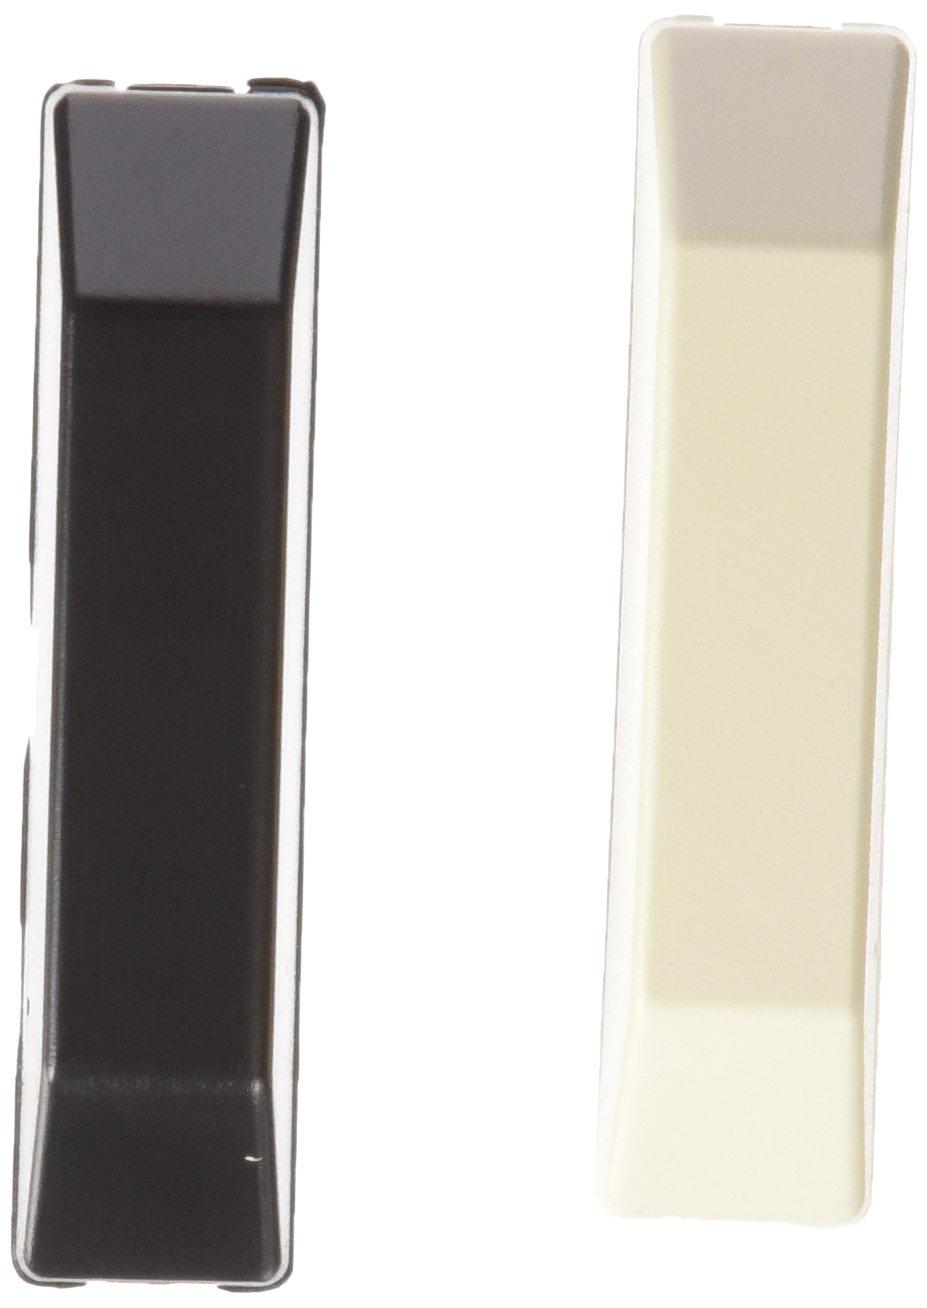 Kwikee 905326000 Black Large Rectangular Magnetic Door Switch